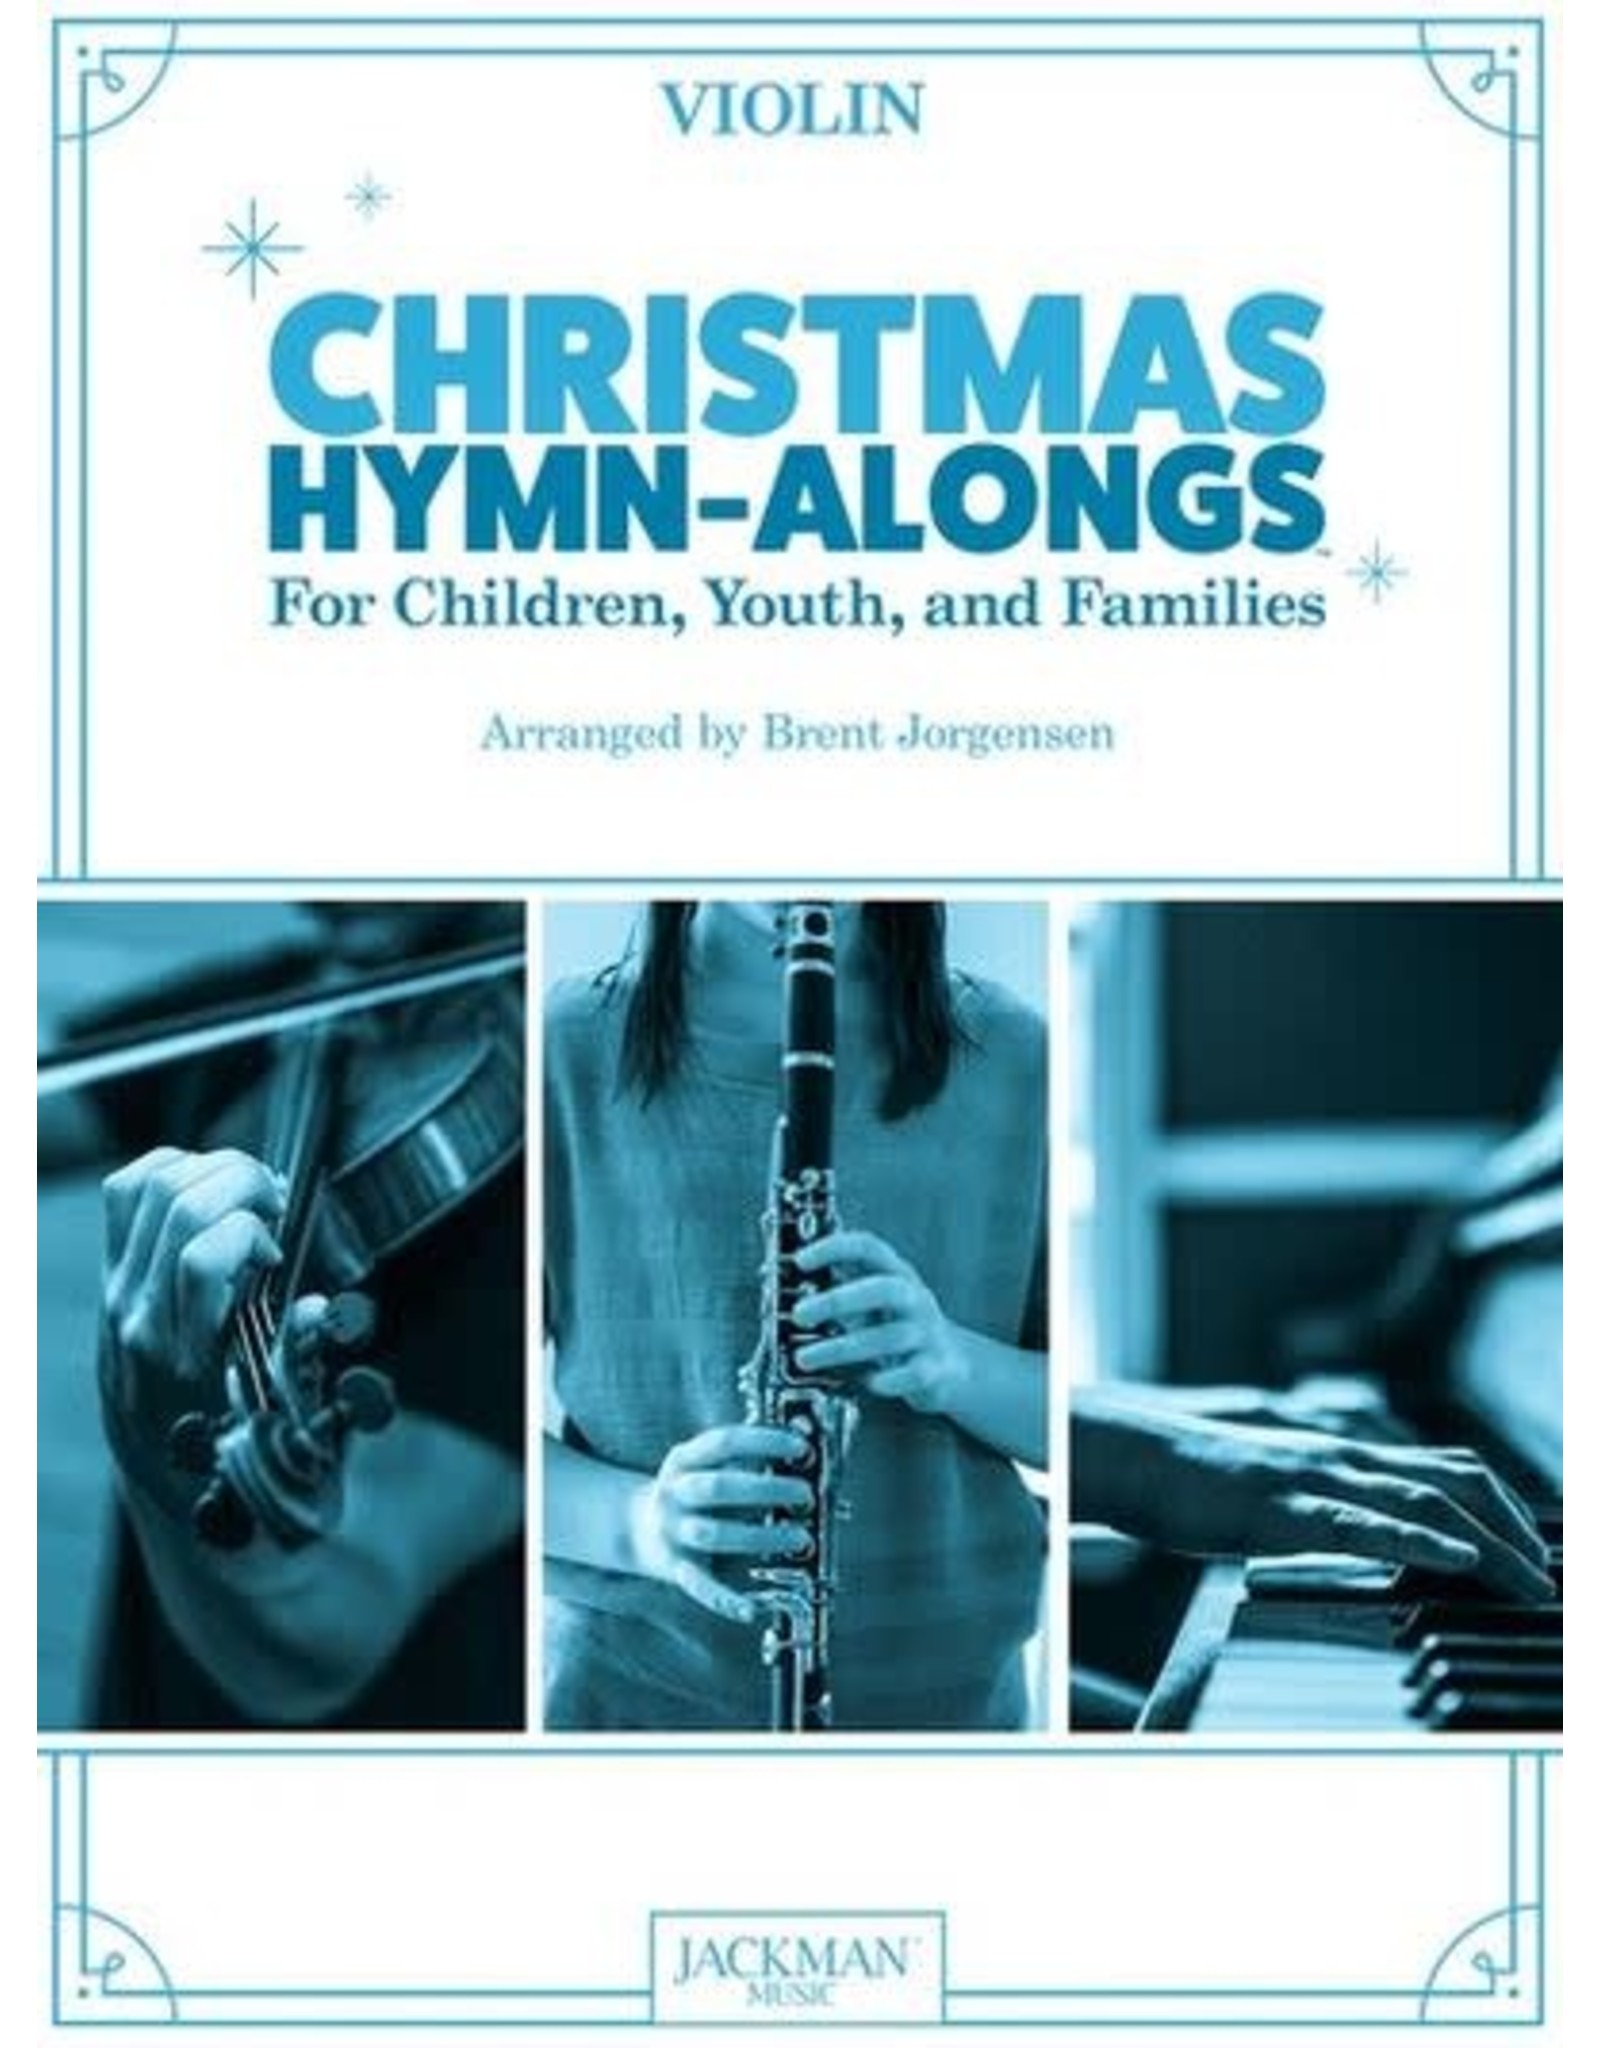 Jackman Music Christmas Hymn-Alongs - arr. Brent Jorgensen - Violin